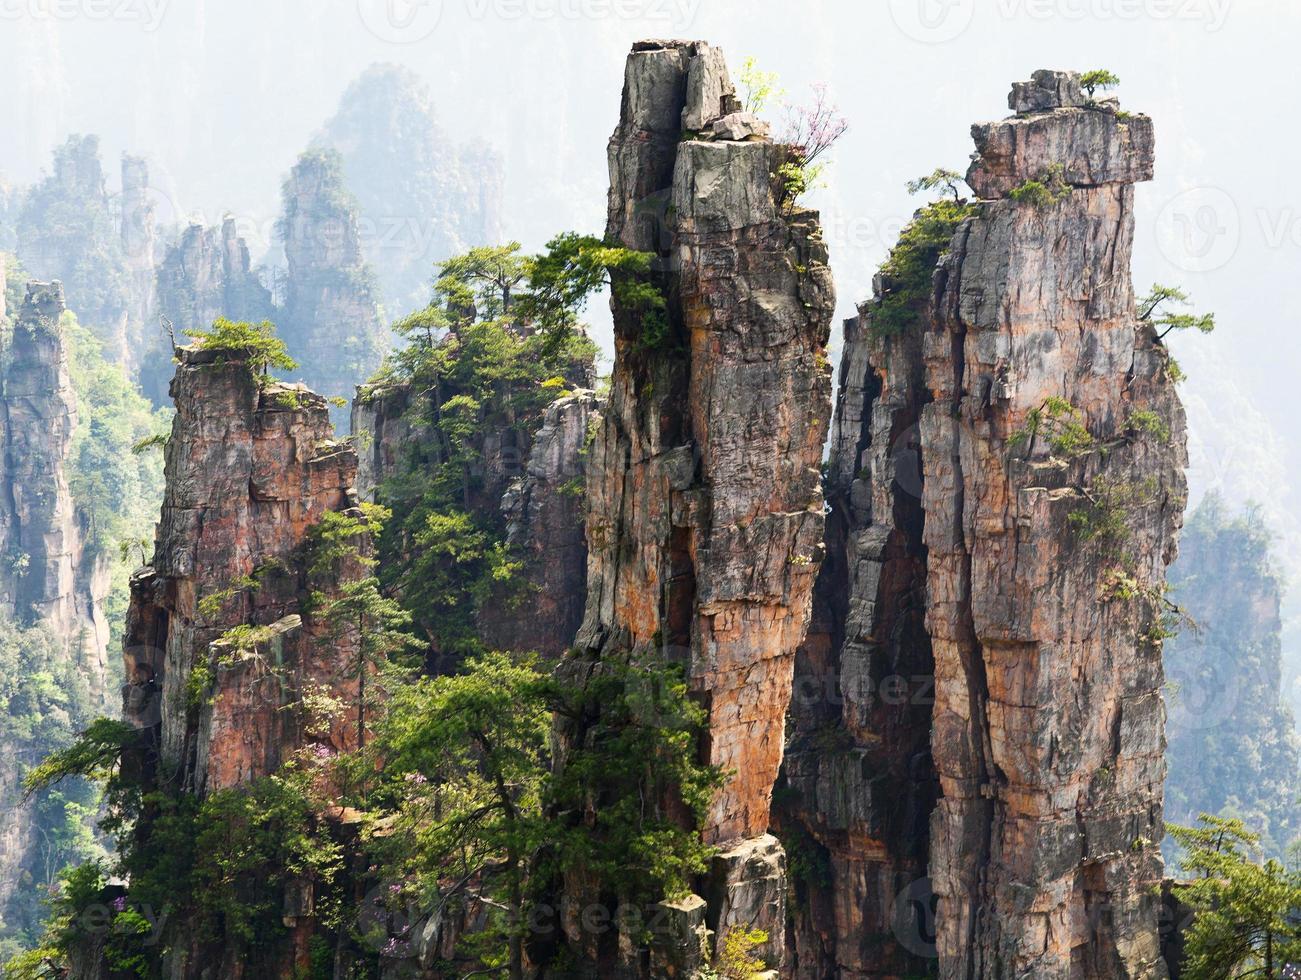 Zhangjiajie National Forest Park in Hunan Province, China photo